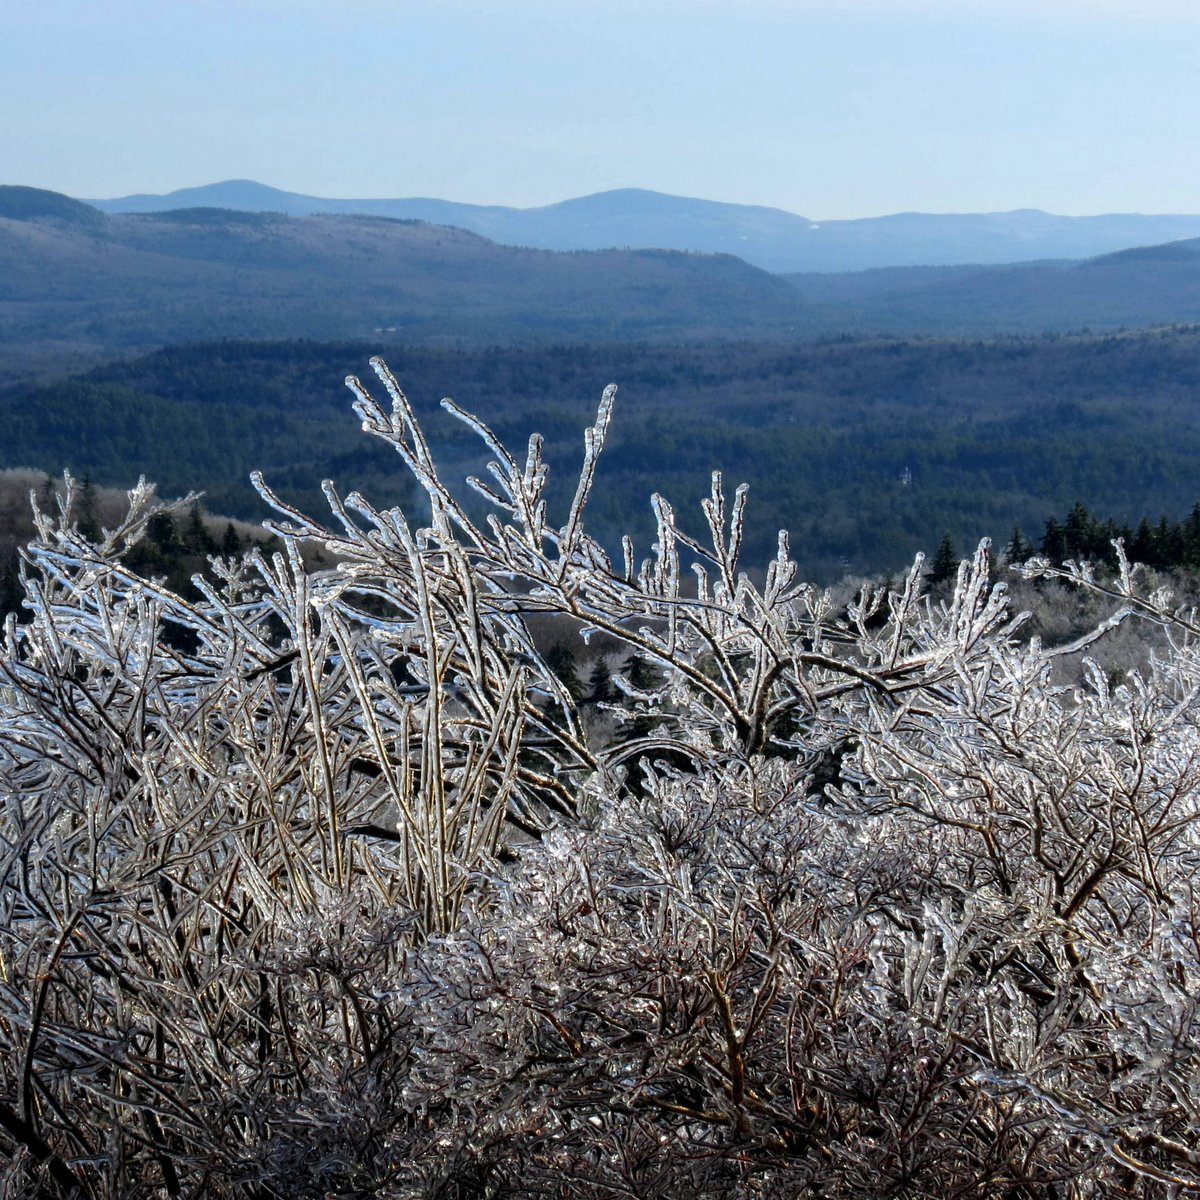 15. Icy Blueberry Bush